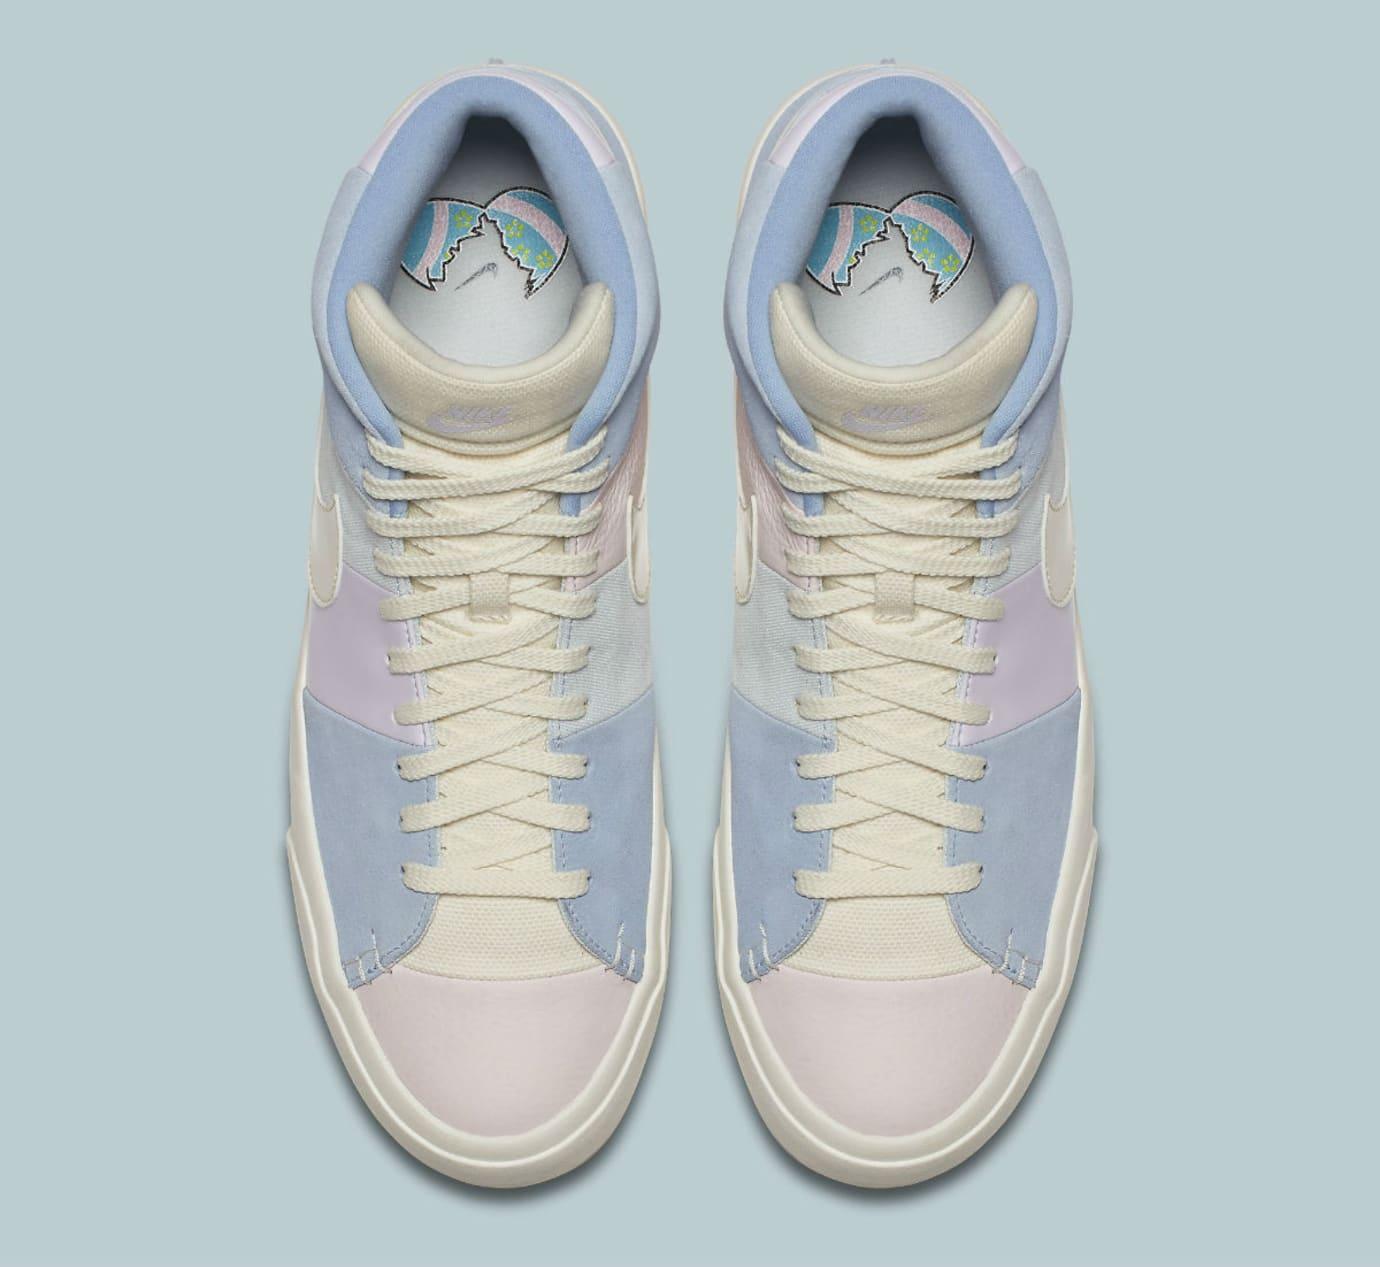 Nike Blazer Easter 2018 Release Date AO2368-600 Top